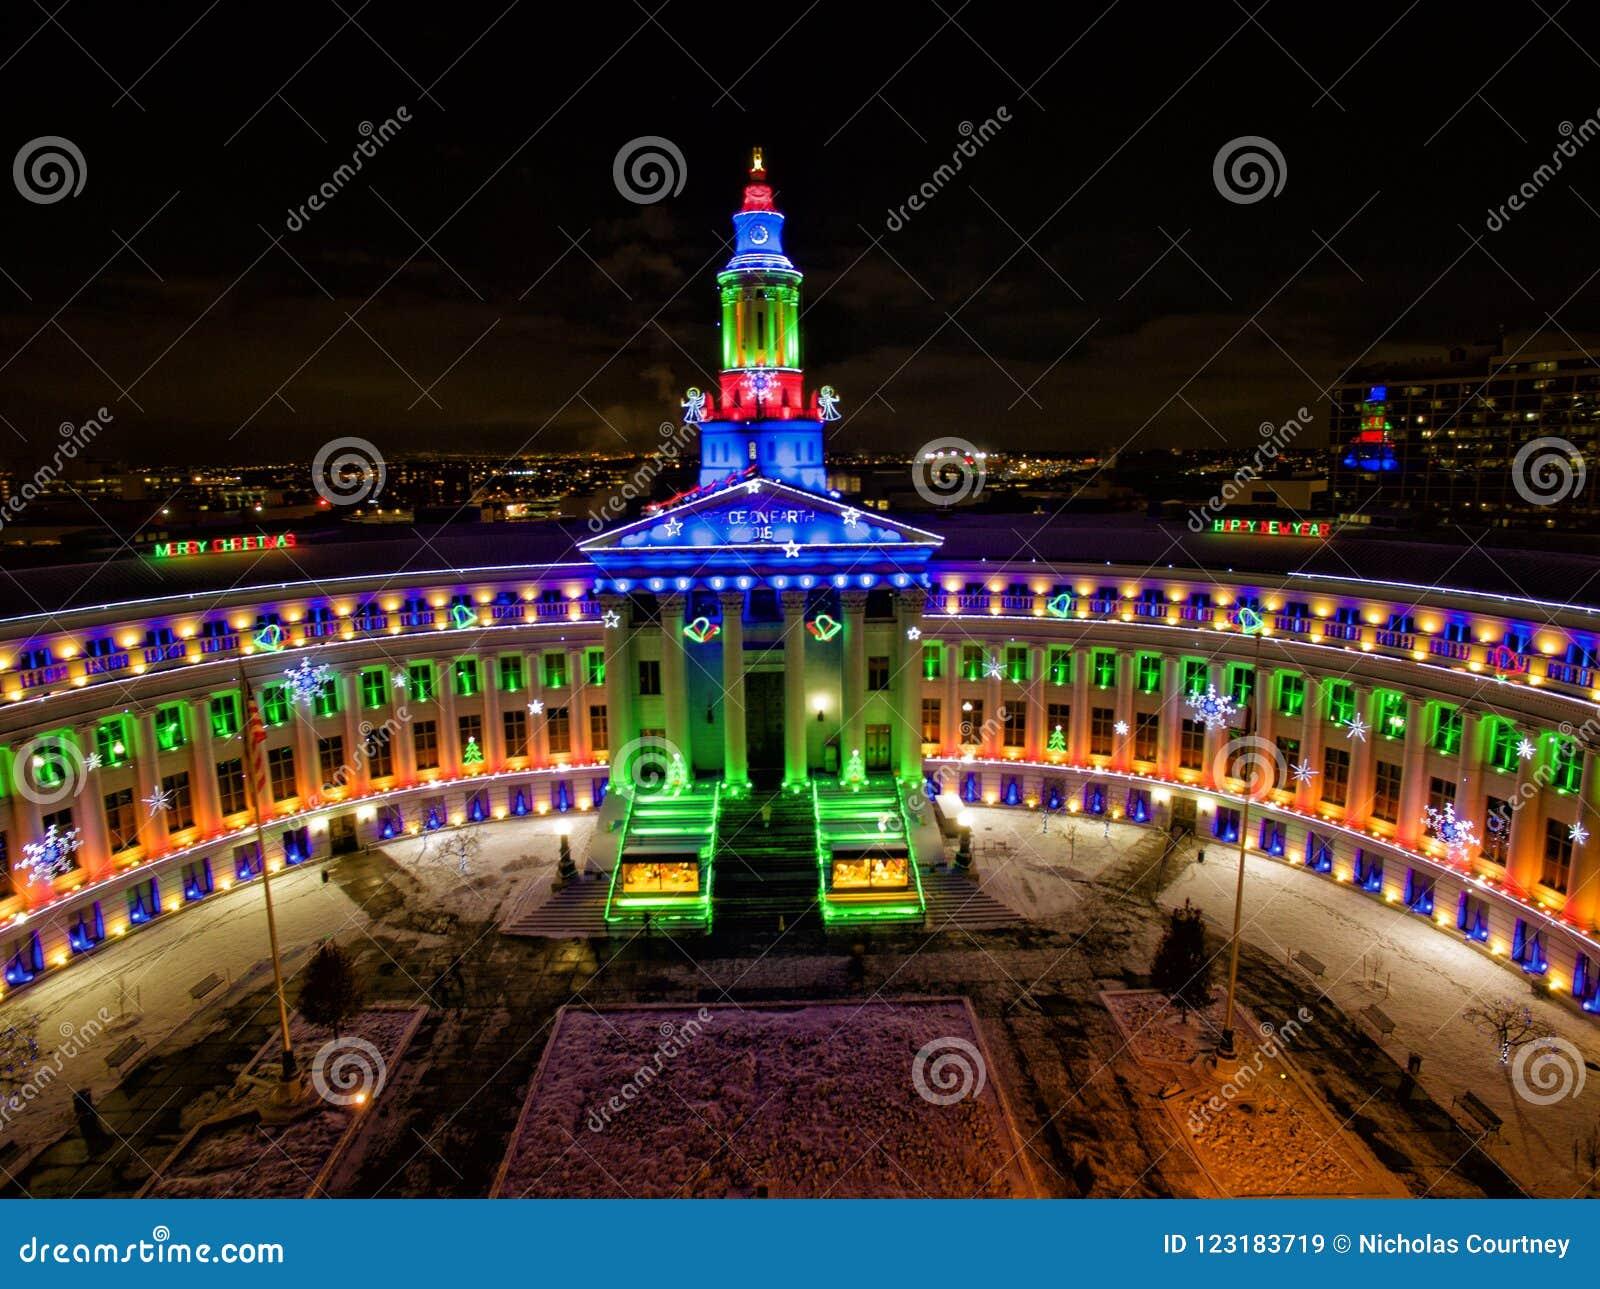 Christmas In Denver Colorado.Aerial Drone Photo Christmas Lights On City Hall Denver